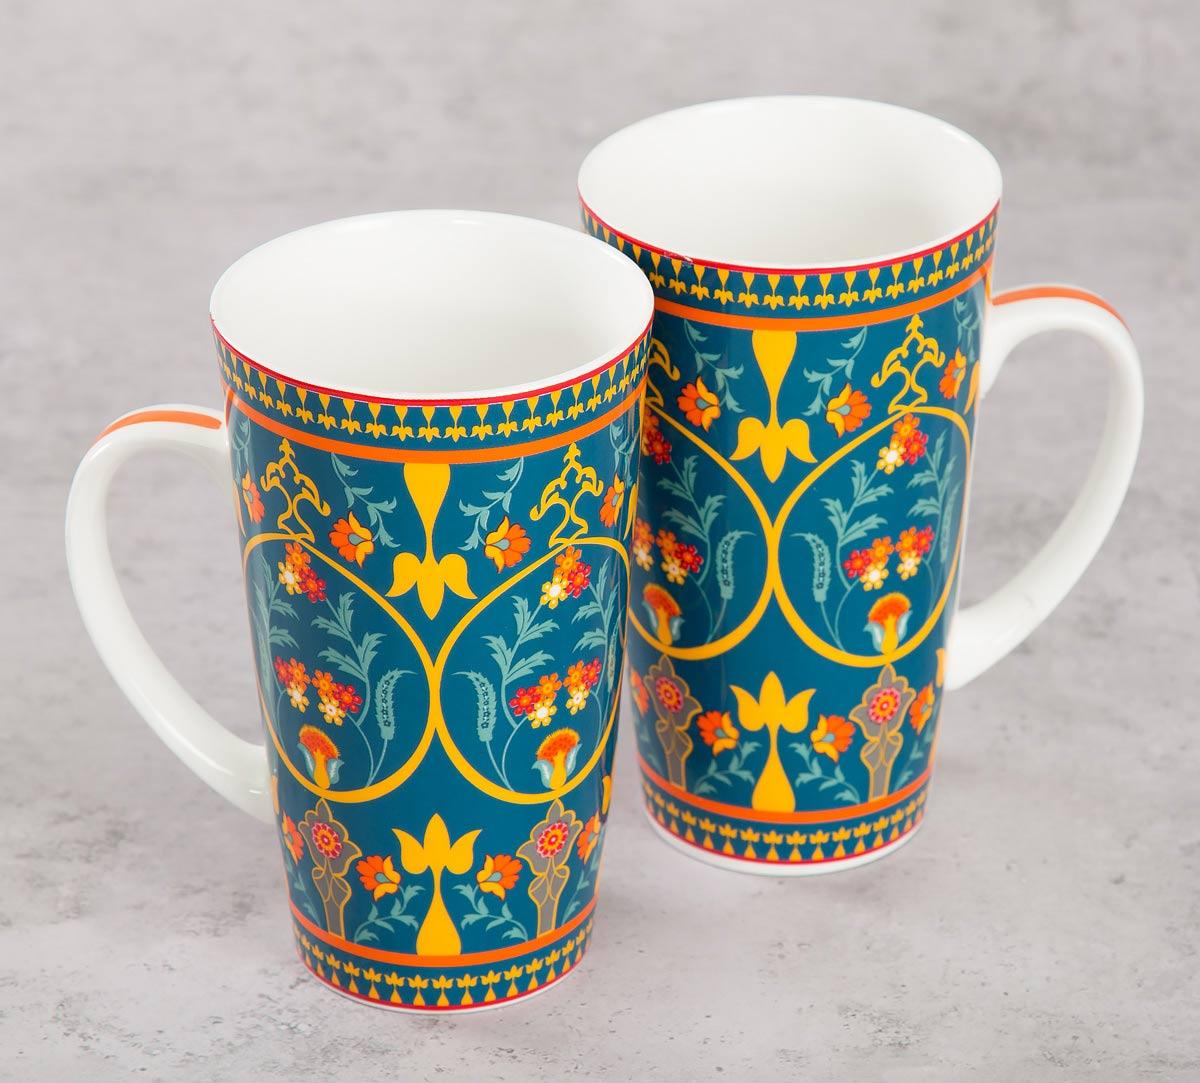 Swirling Safari Conical Mug (Set of 2)